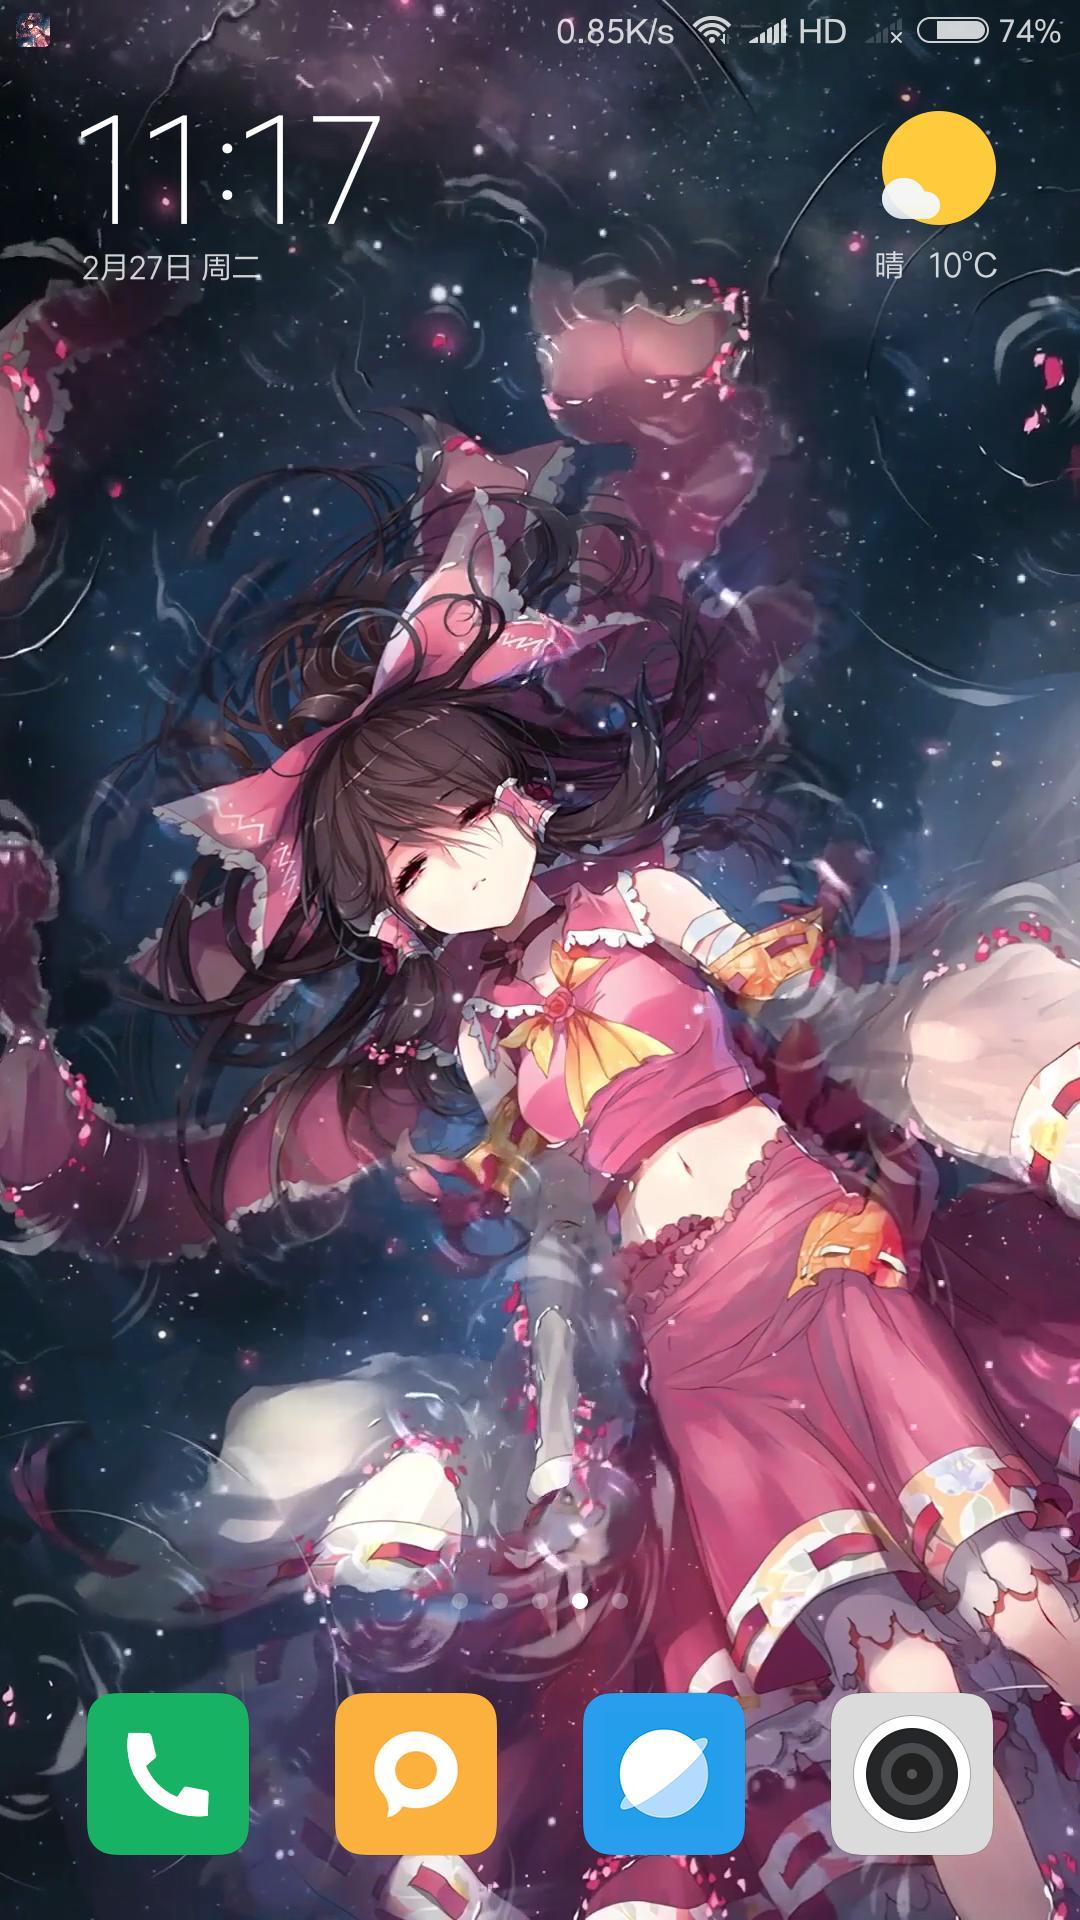 Android 用の 博麗霊夢 アニメビデオダイナミック壁紙 博丽灵梦 Apk